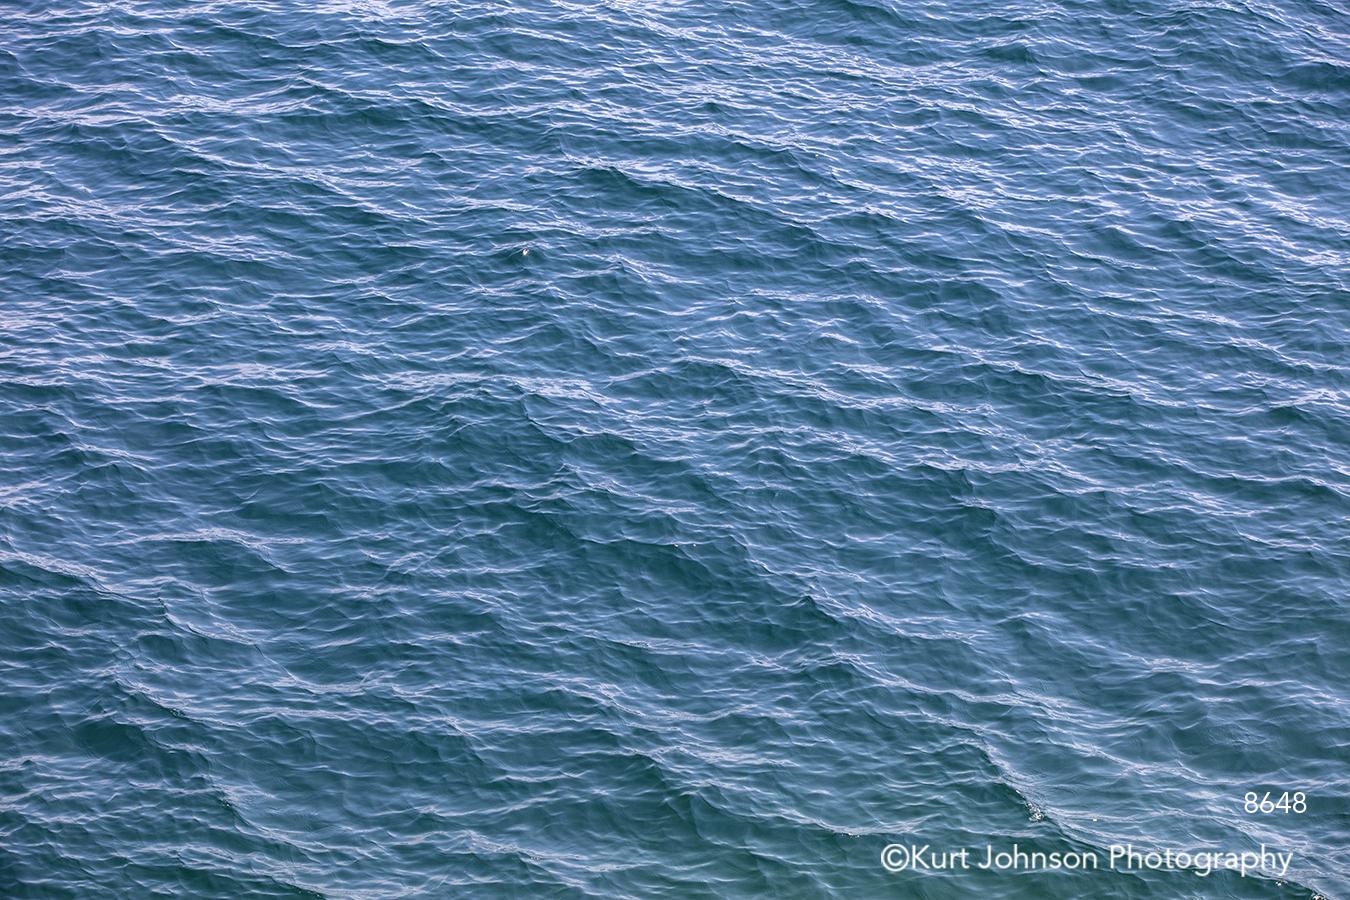 water waves blue ocean rive stream texture pattern waterscape